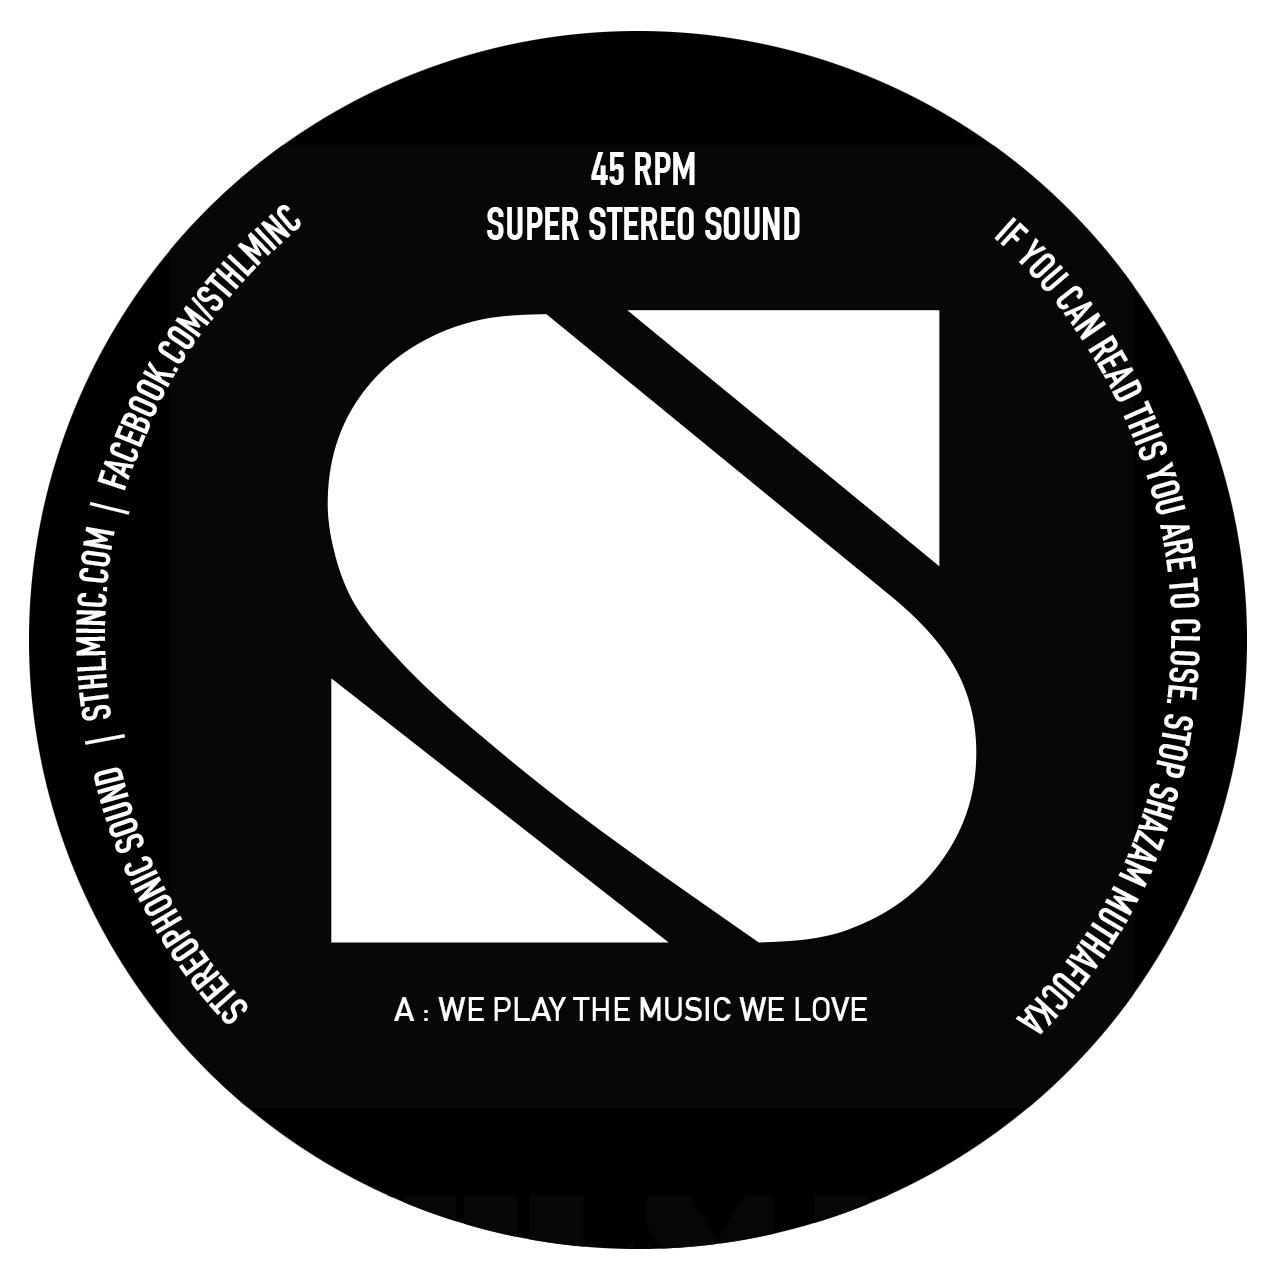 12inch record label-FINAL